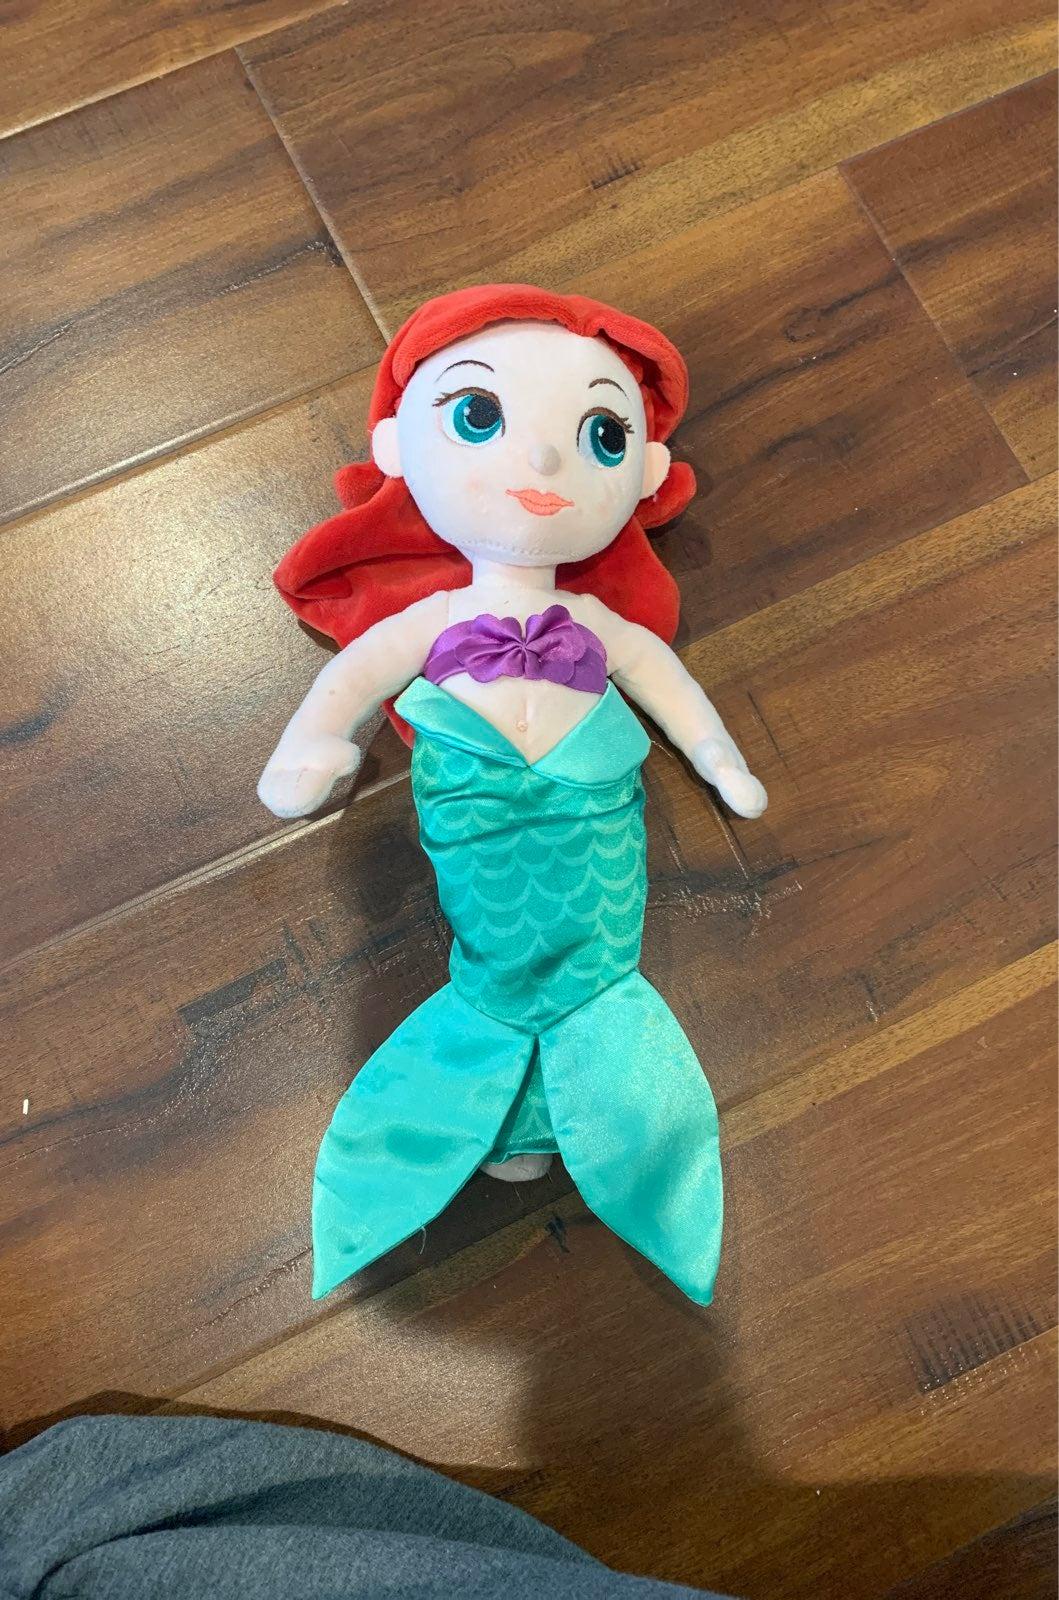 Disney Store Ariel Plush Doll